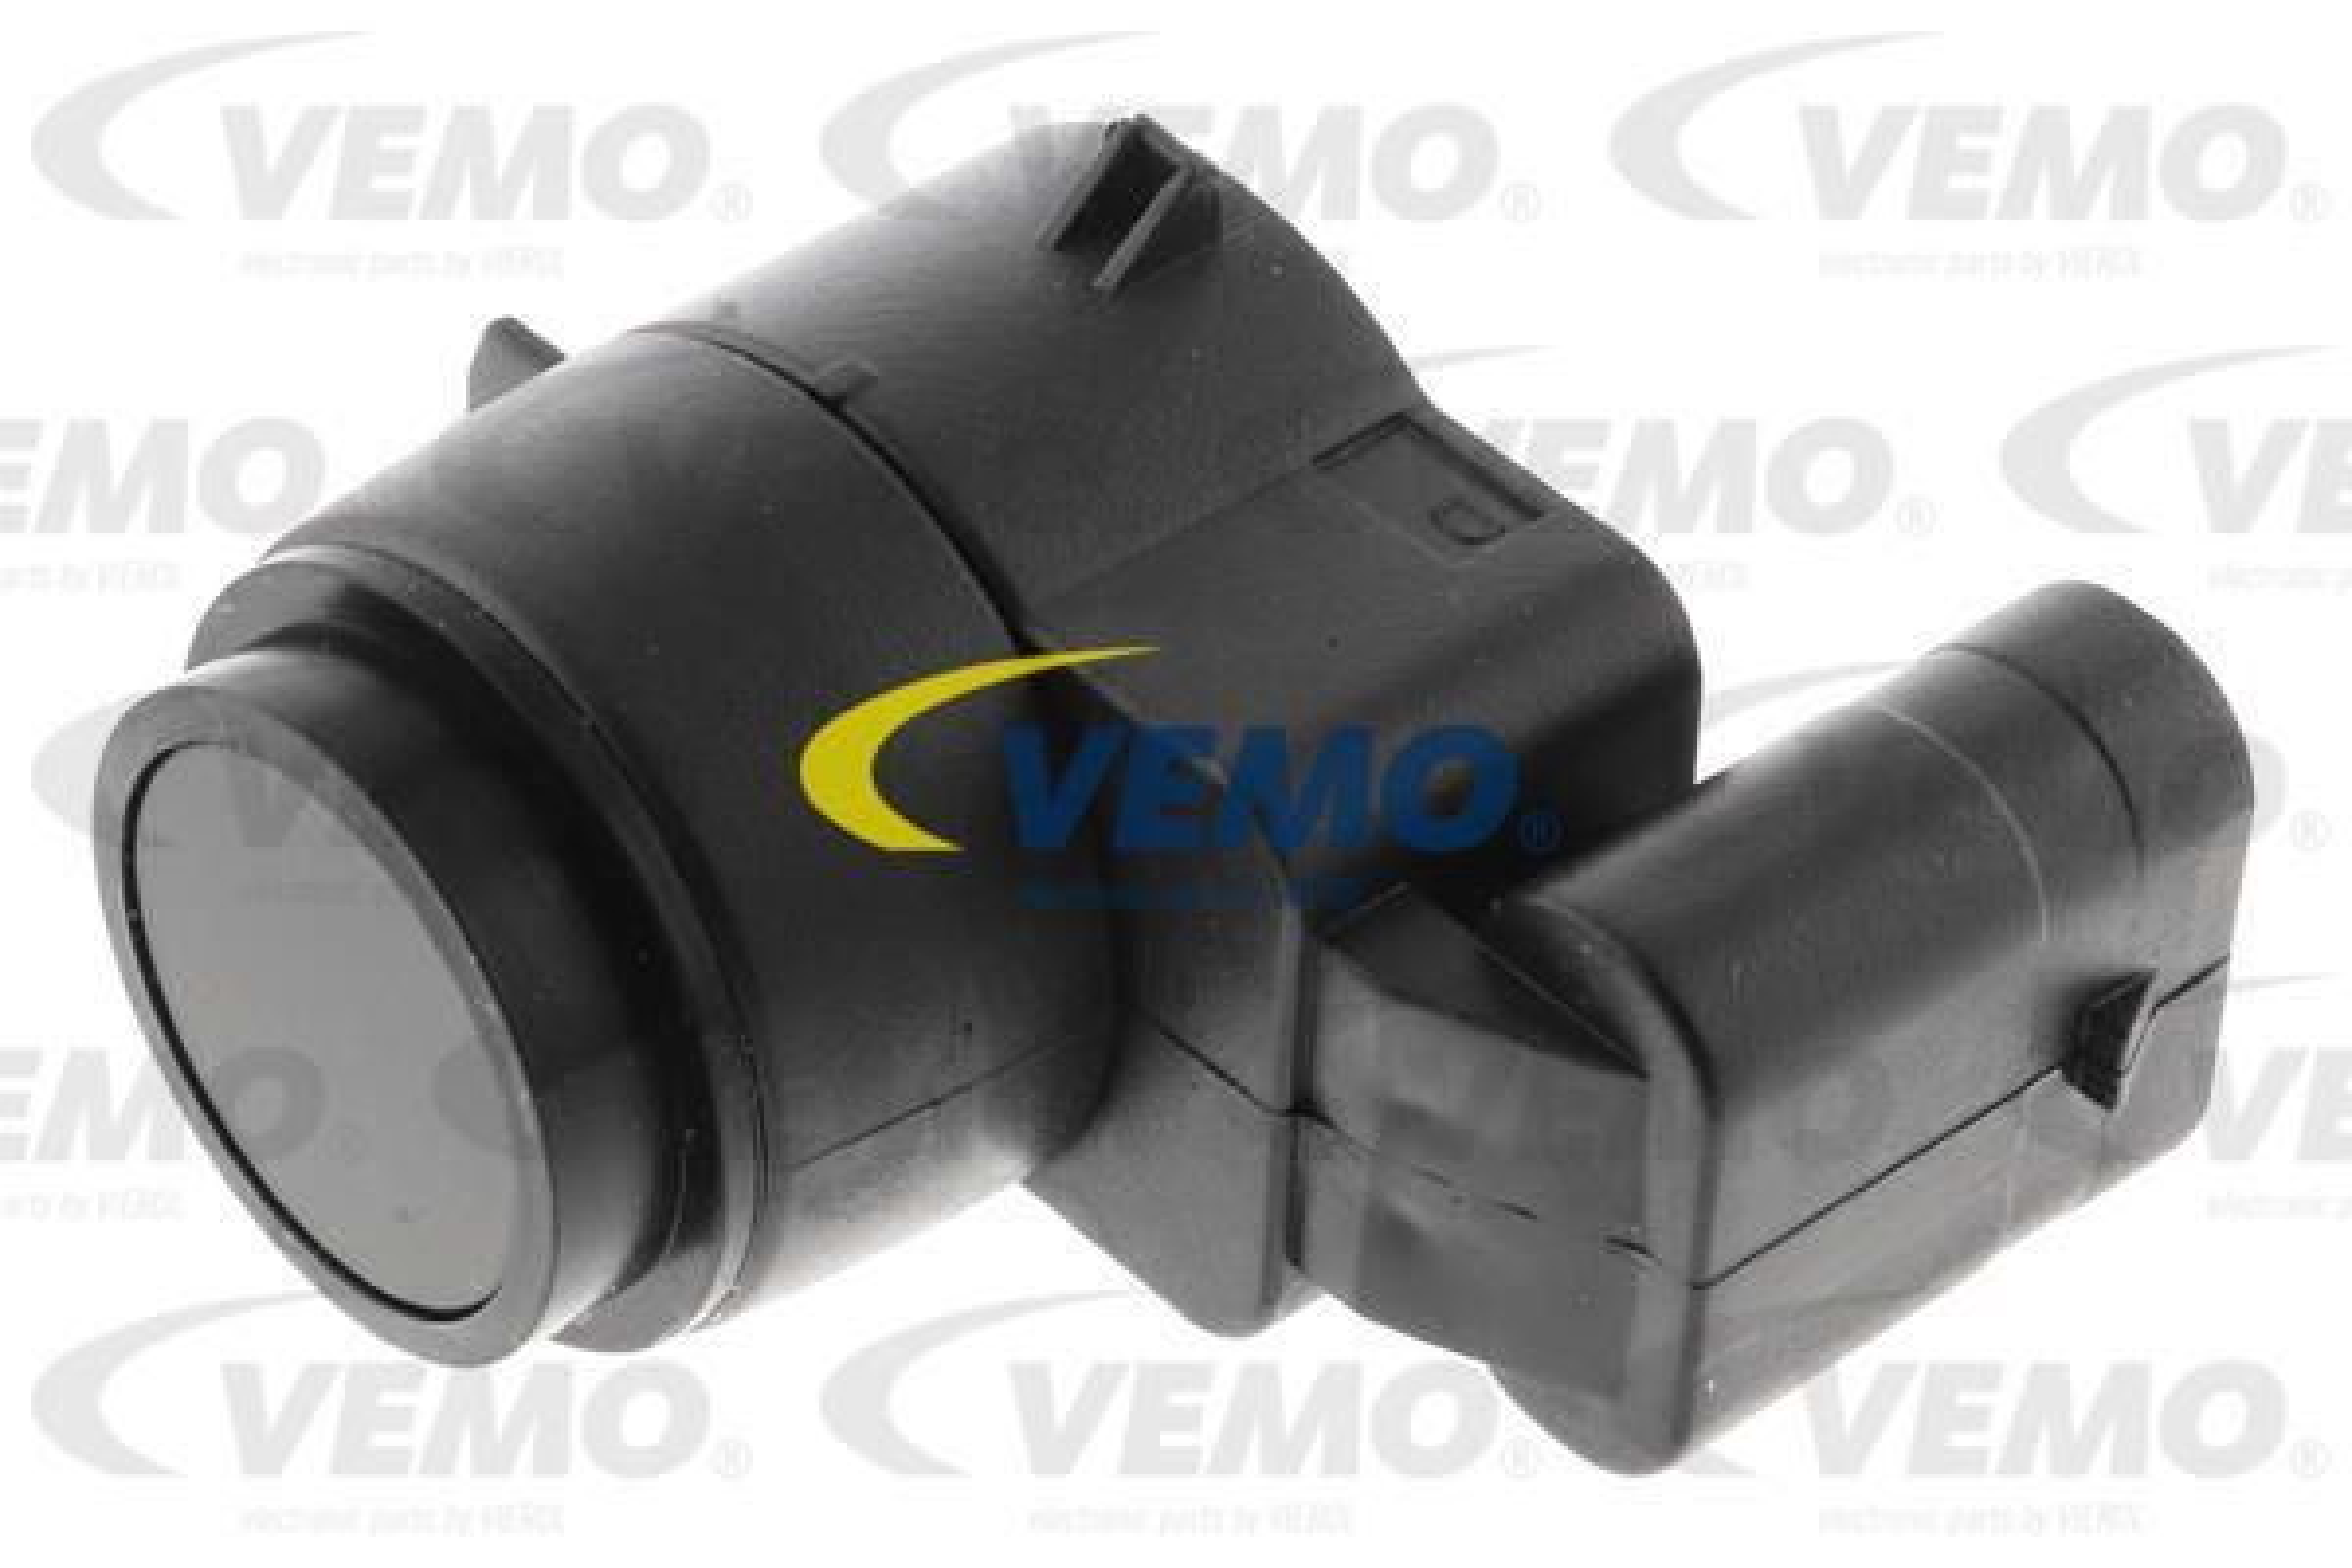 V20-72-0034 VEMO Parkeersensor – online kopen